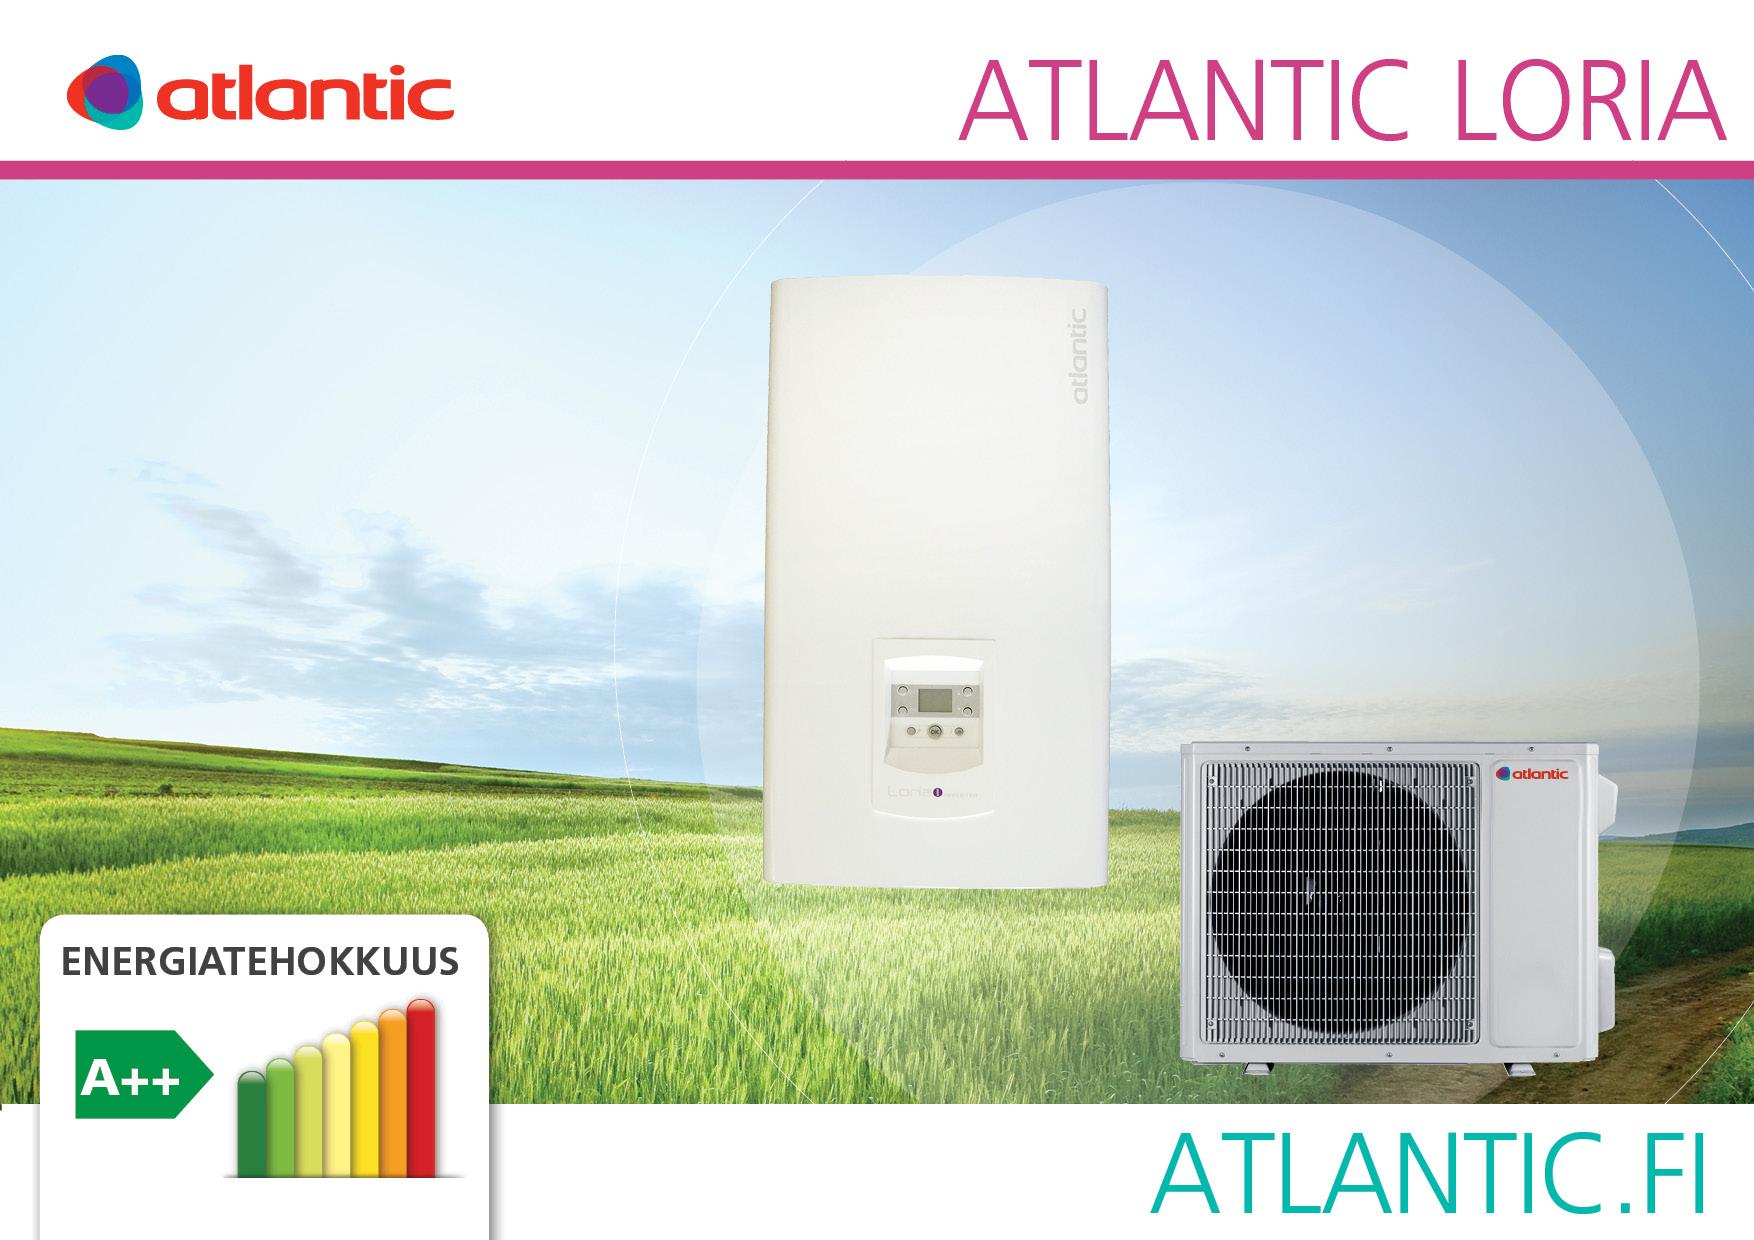 Ilmavesilämpöpumppu Atlantic Loria 6008 8 kW - Taloon.com